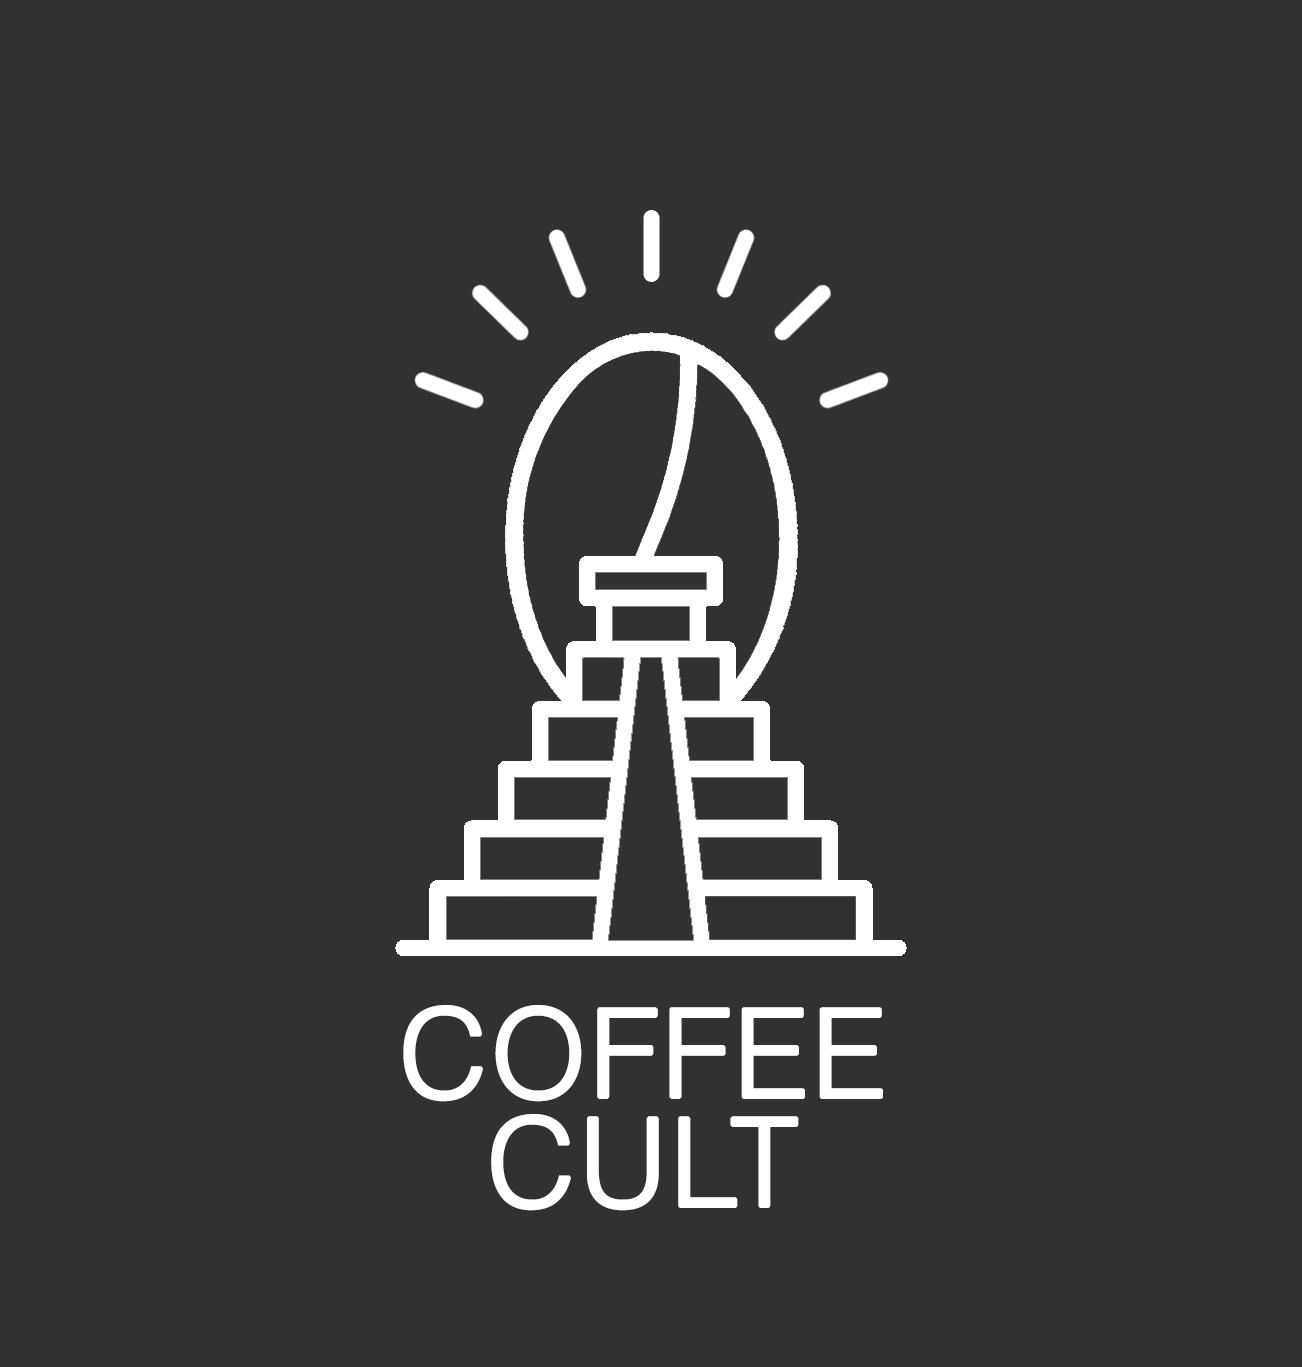 Логотип и фирменный стиль для компании COFFEE CULT фото f_1195bc74af552b4b.png